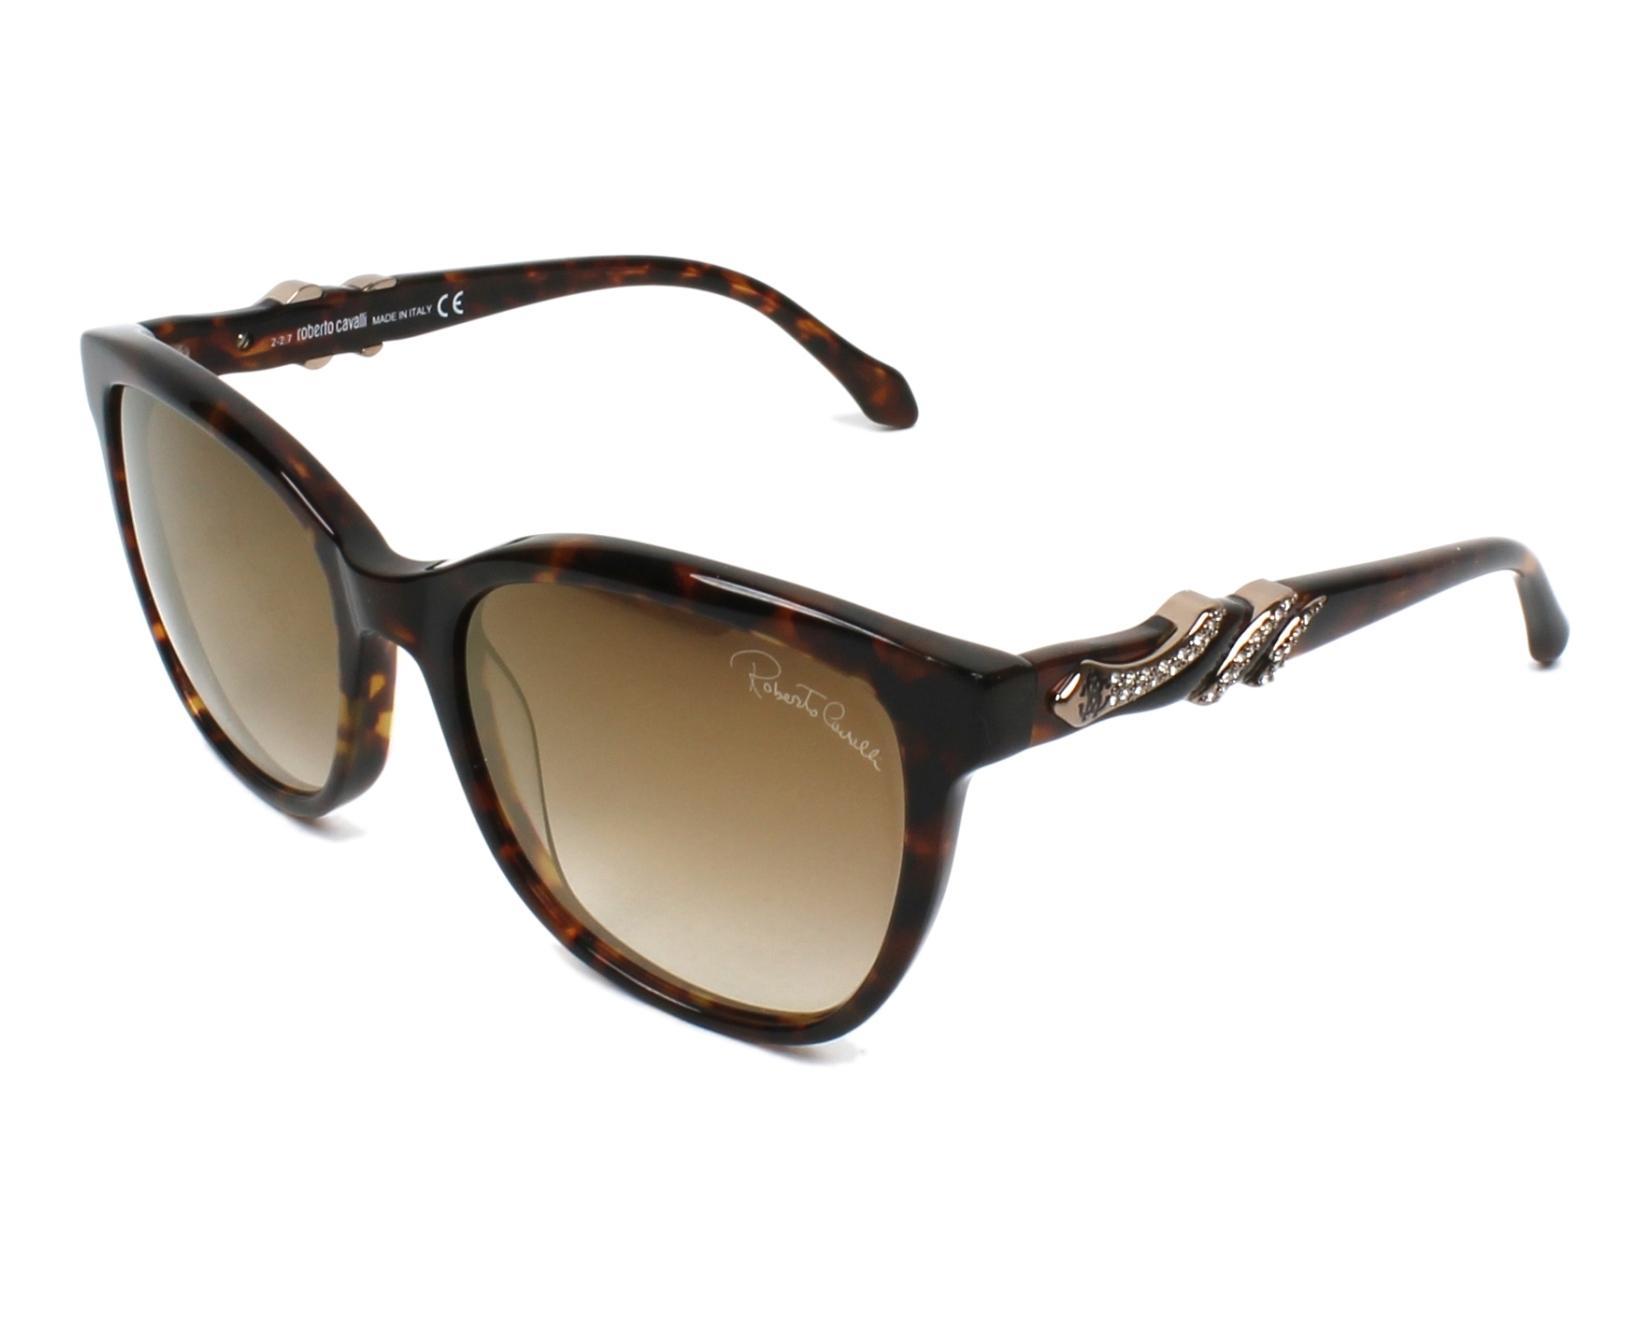 NEW Authentic Roberto Cavalli SunGlasses frames RC-877S 52G | eBay